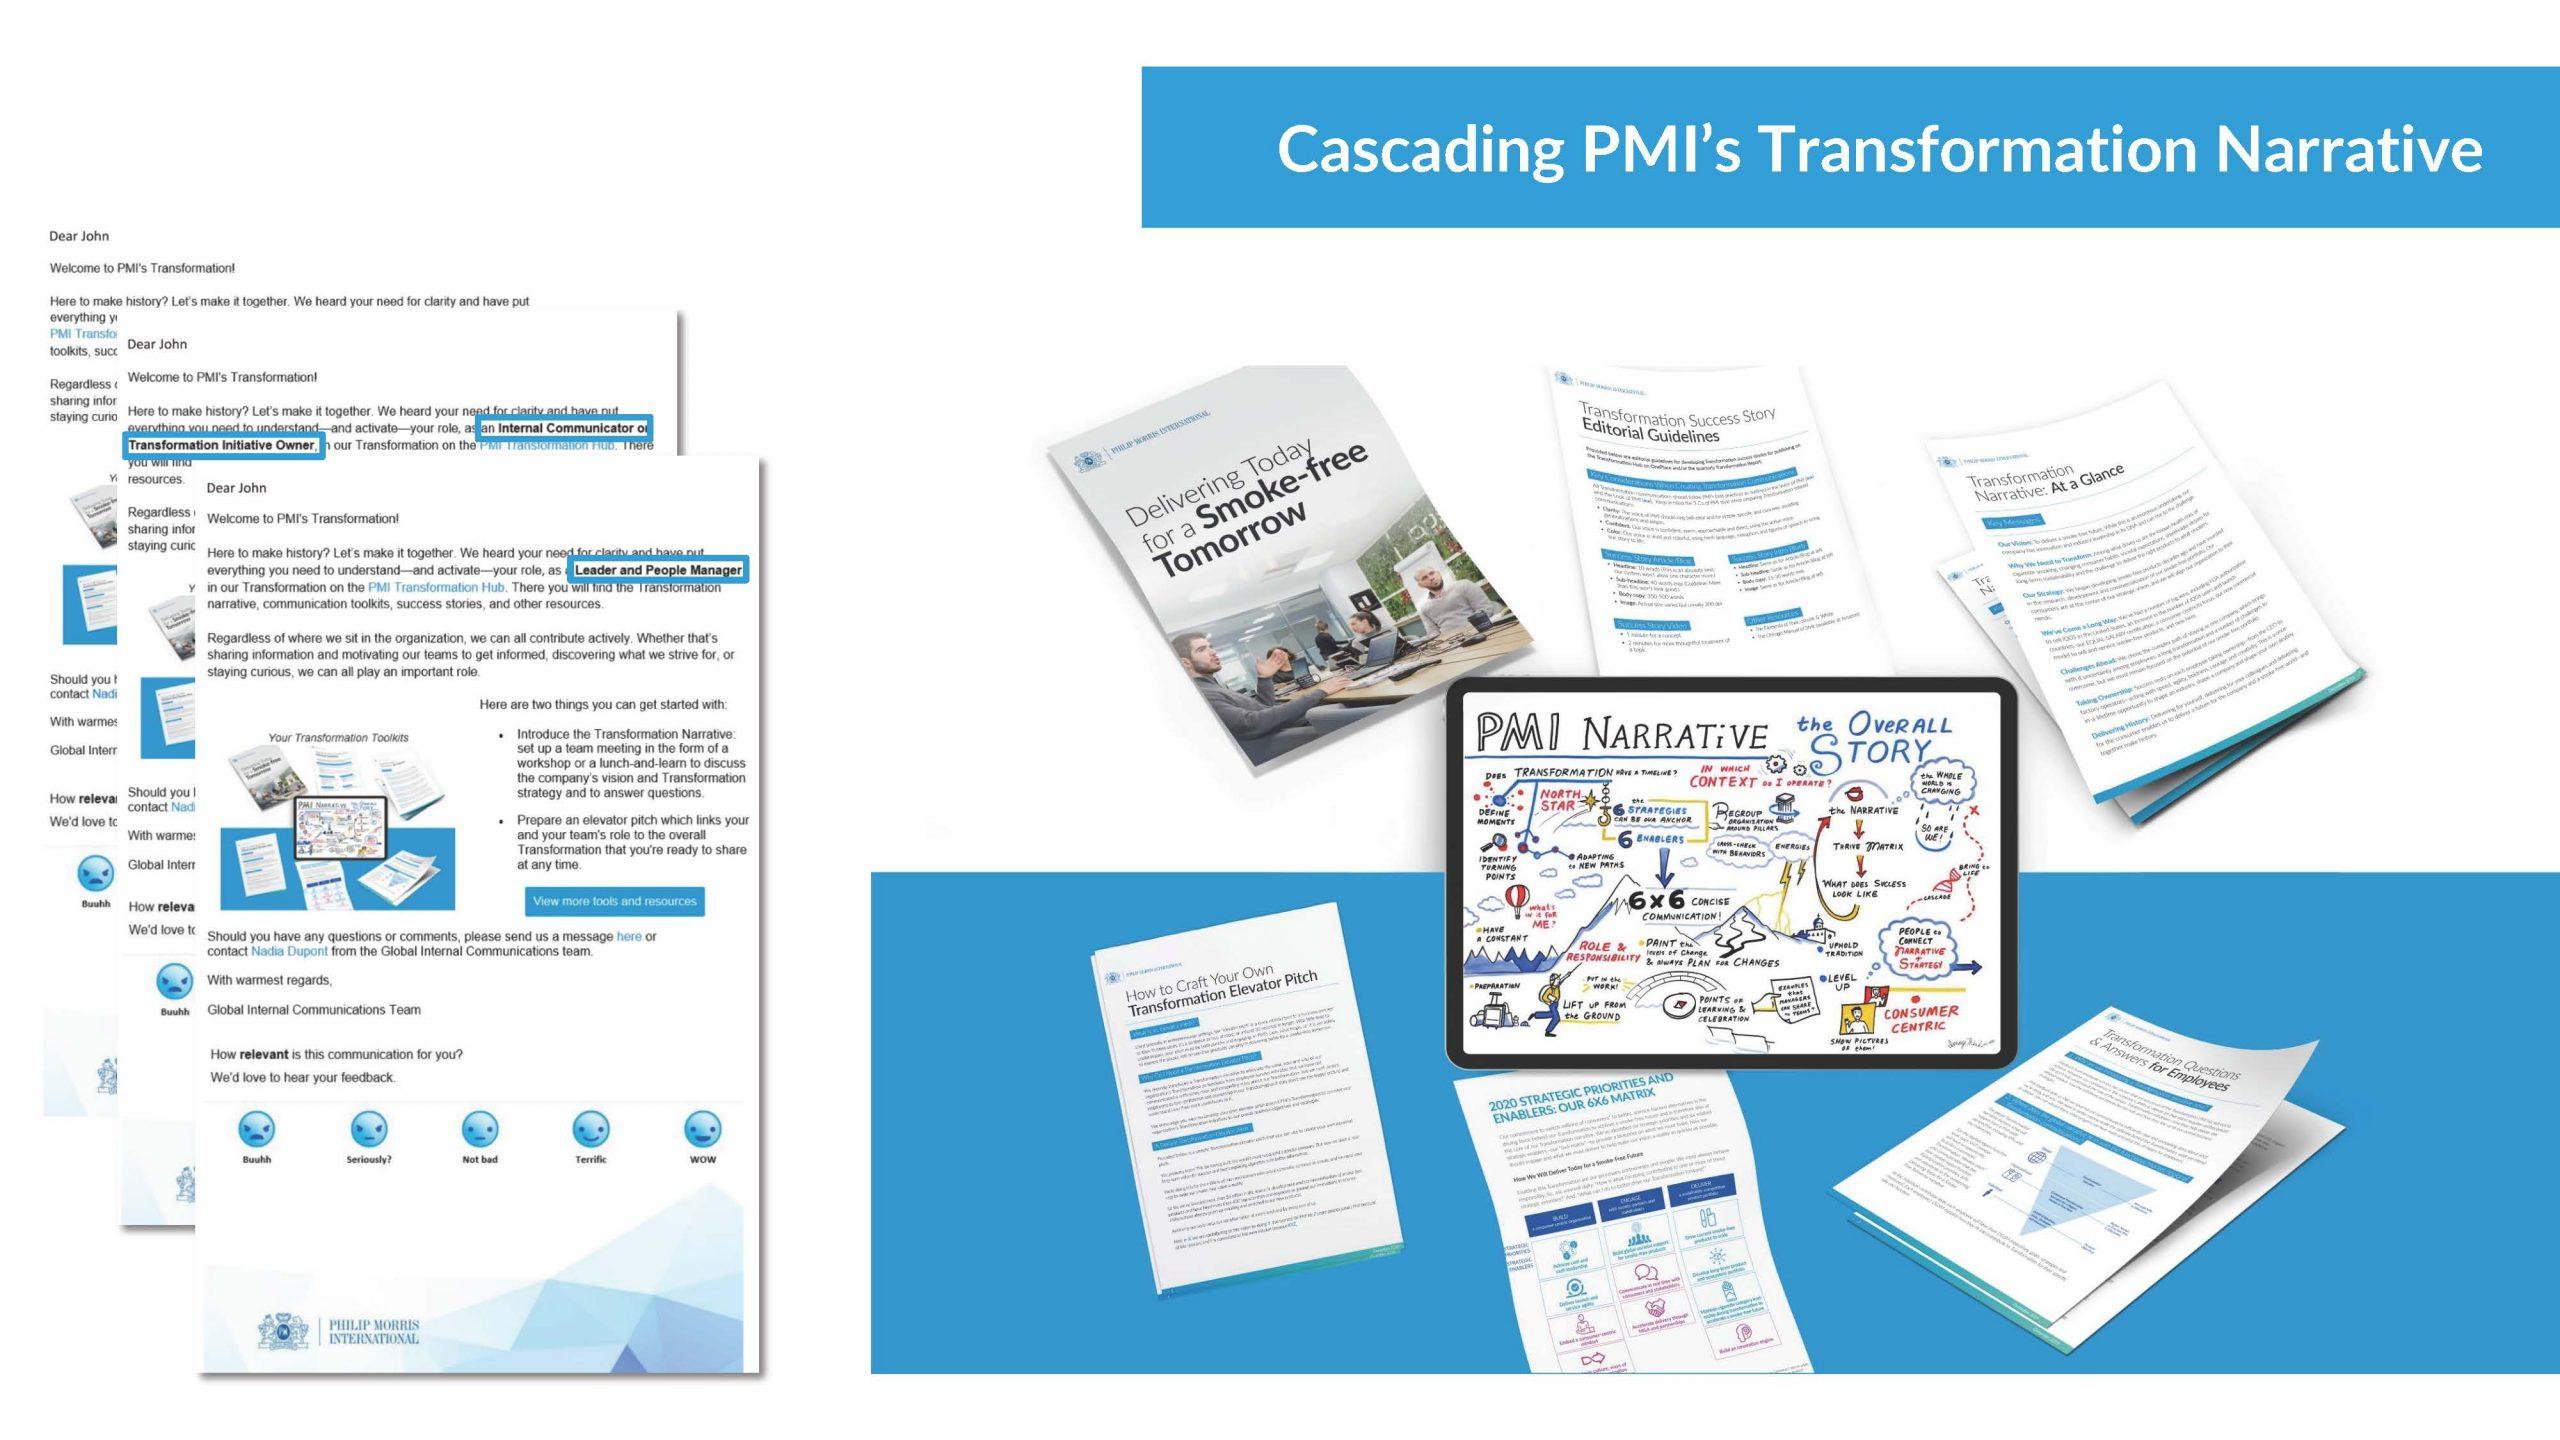 PMI's Transformation Narrative Cascade